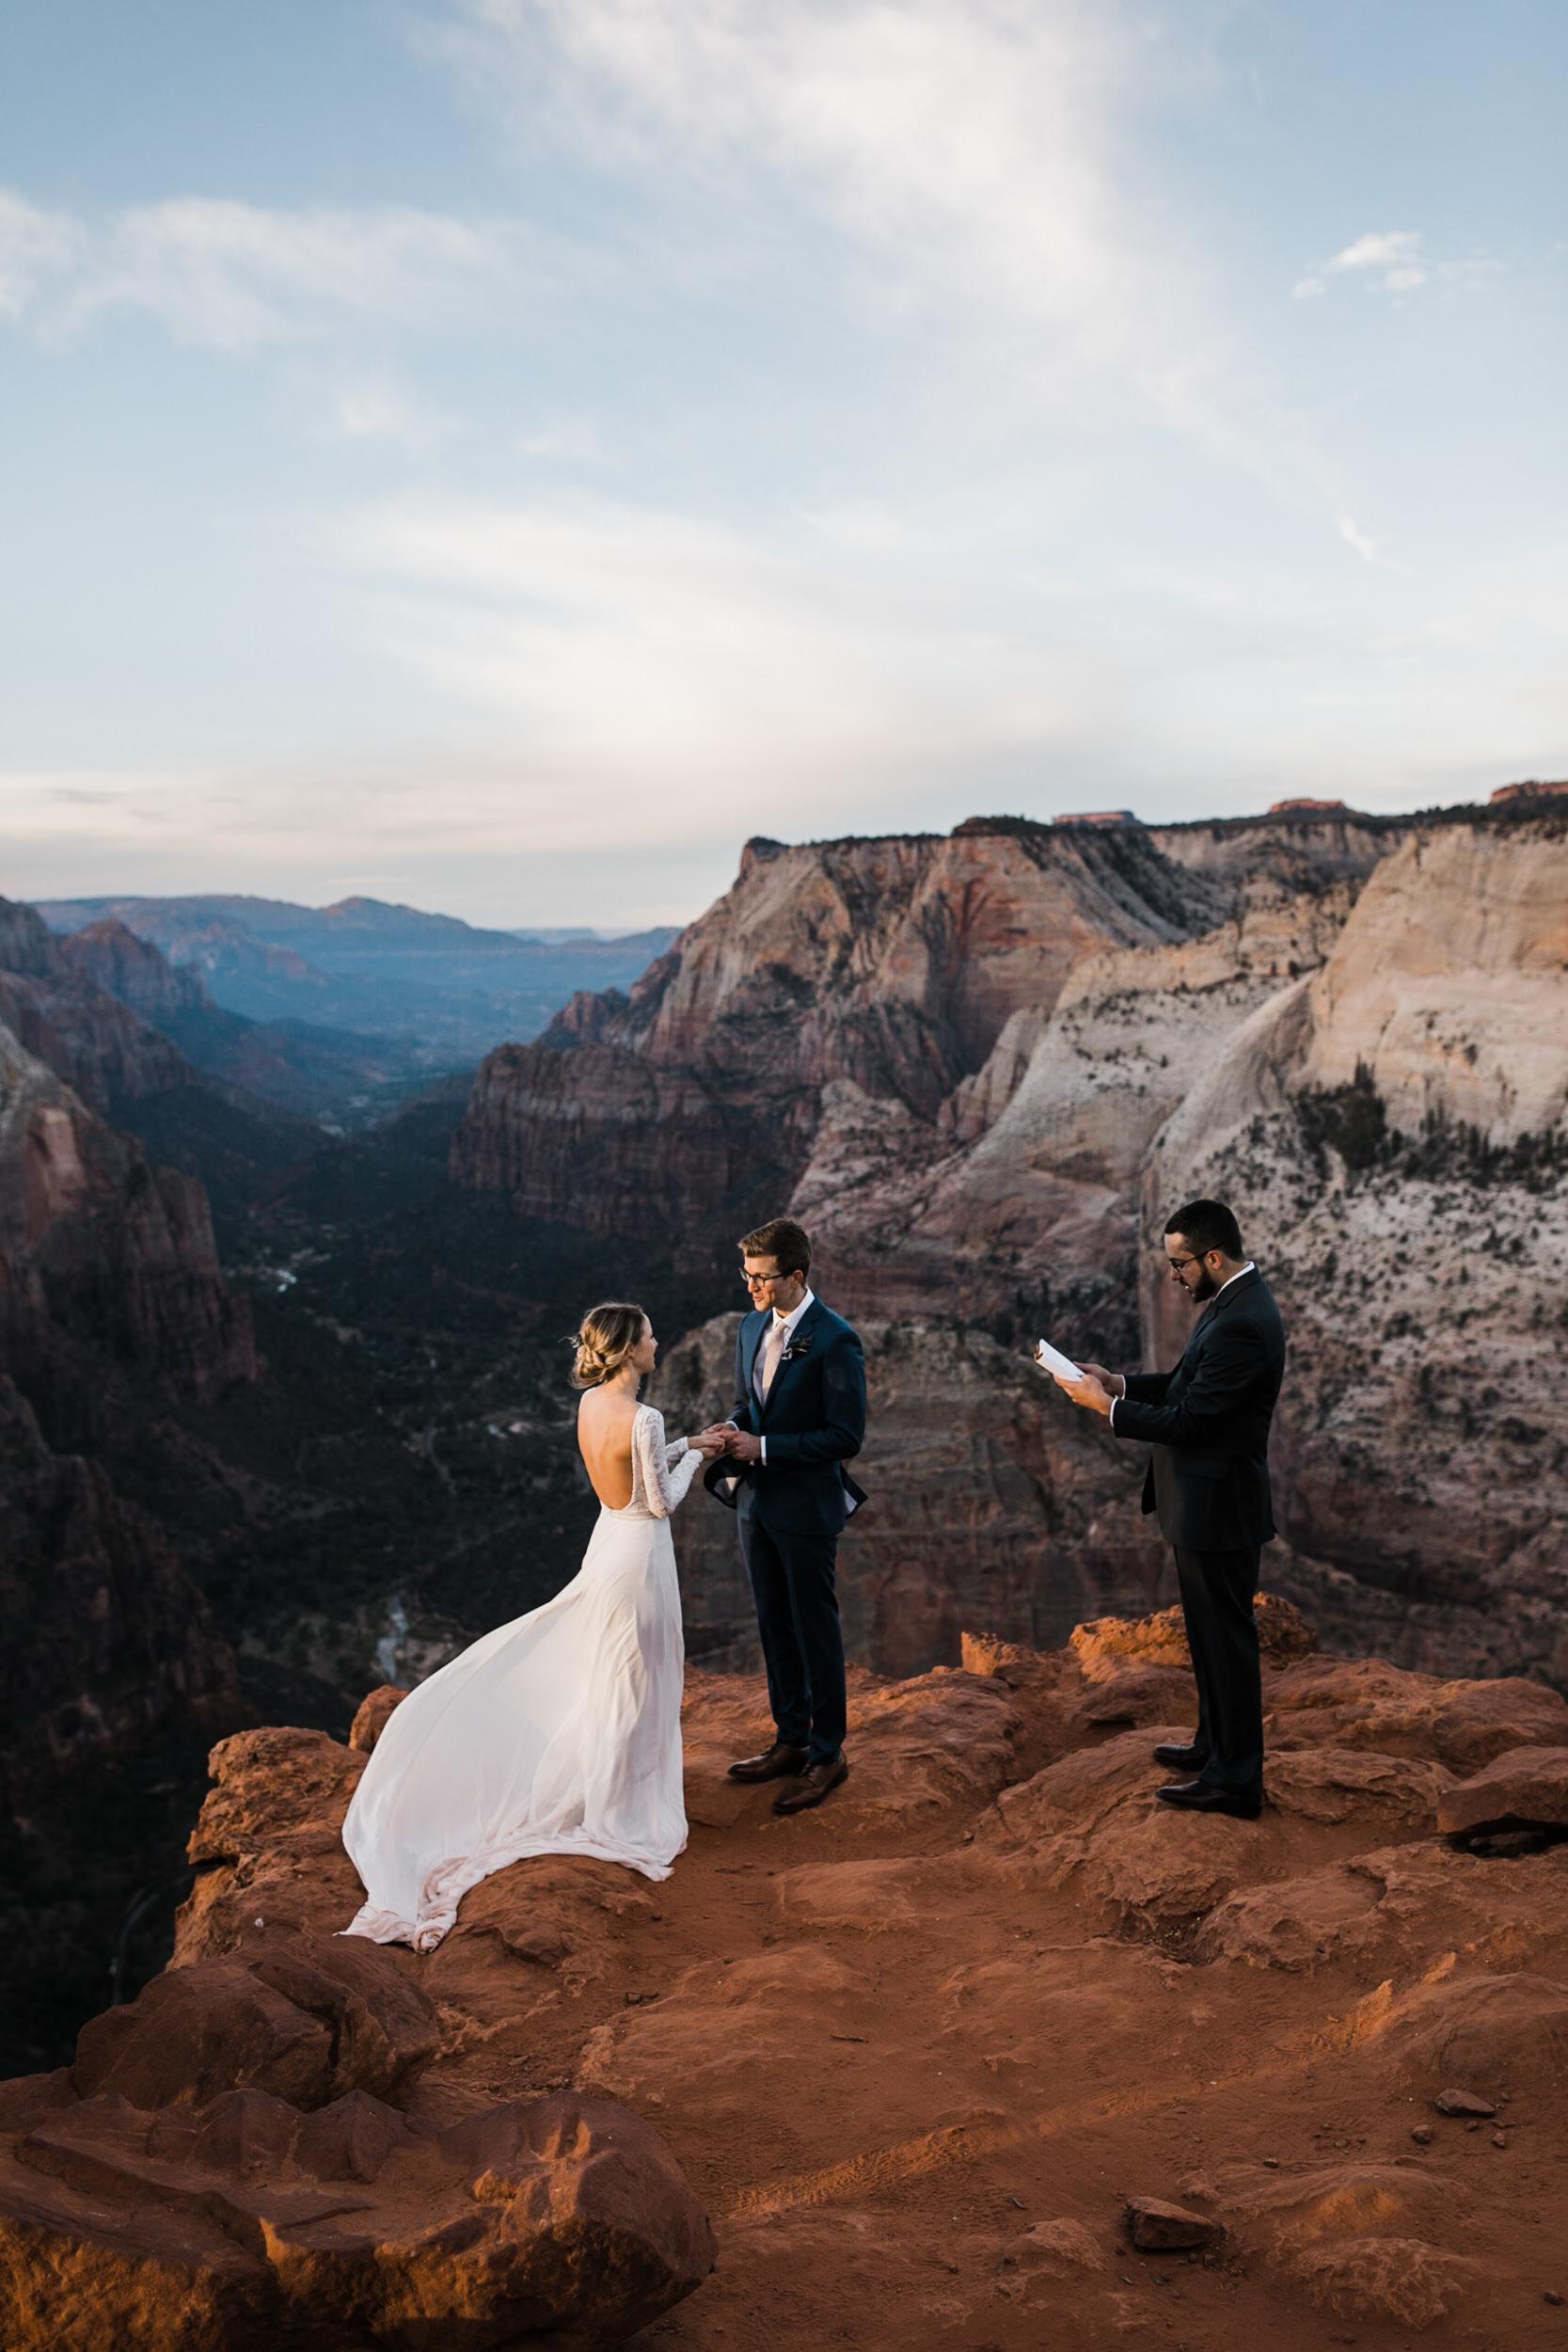 zion national park elopement inspiration | utah adventure wedding photographer